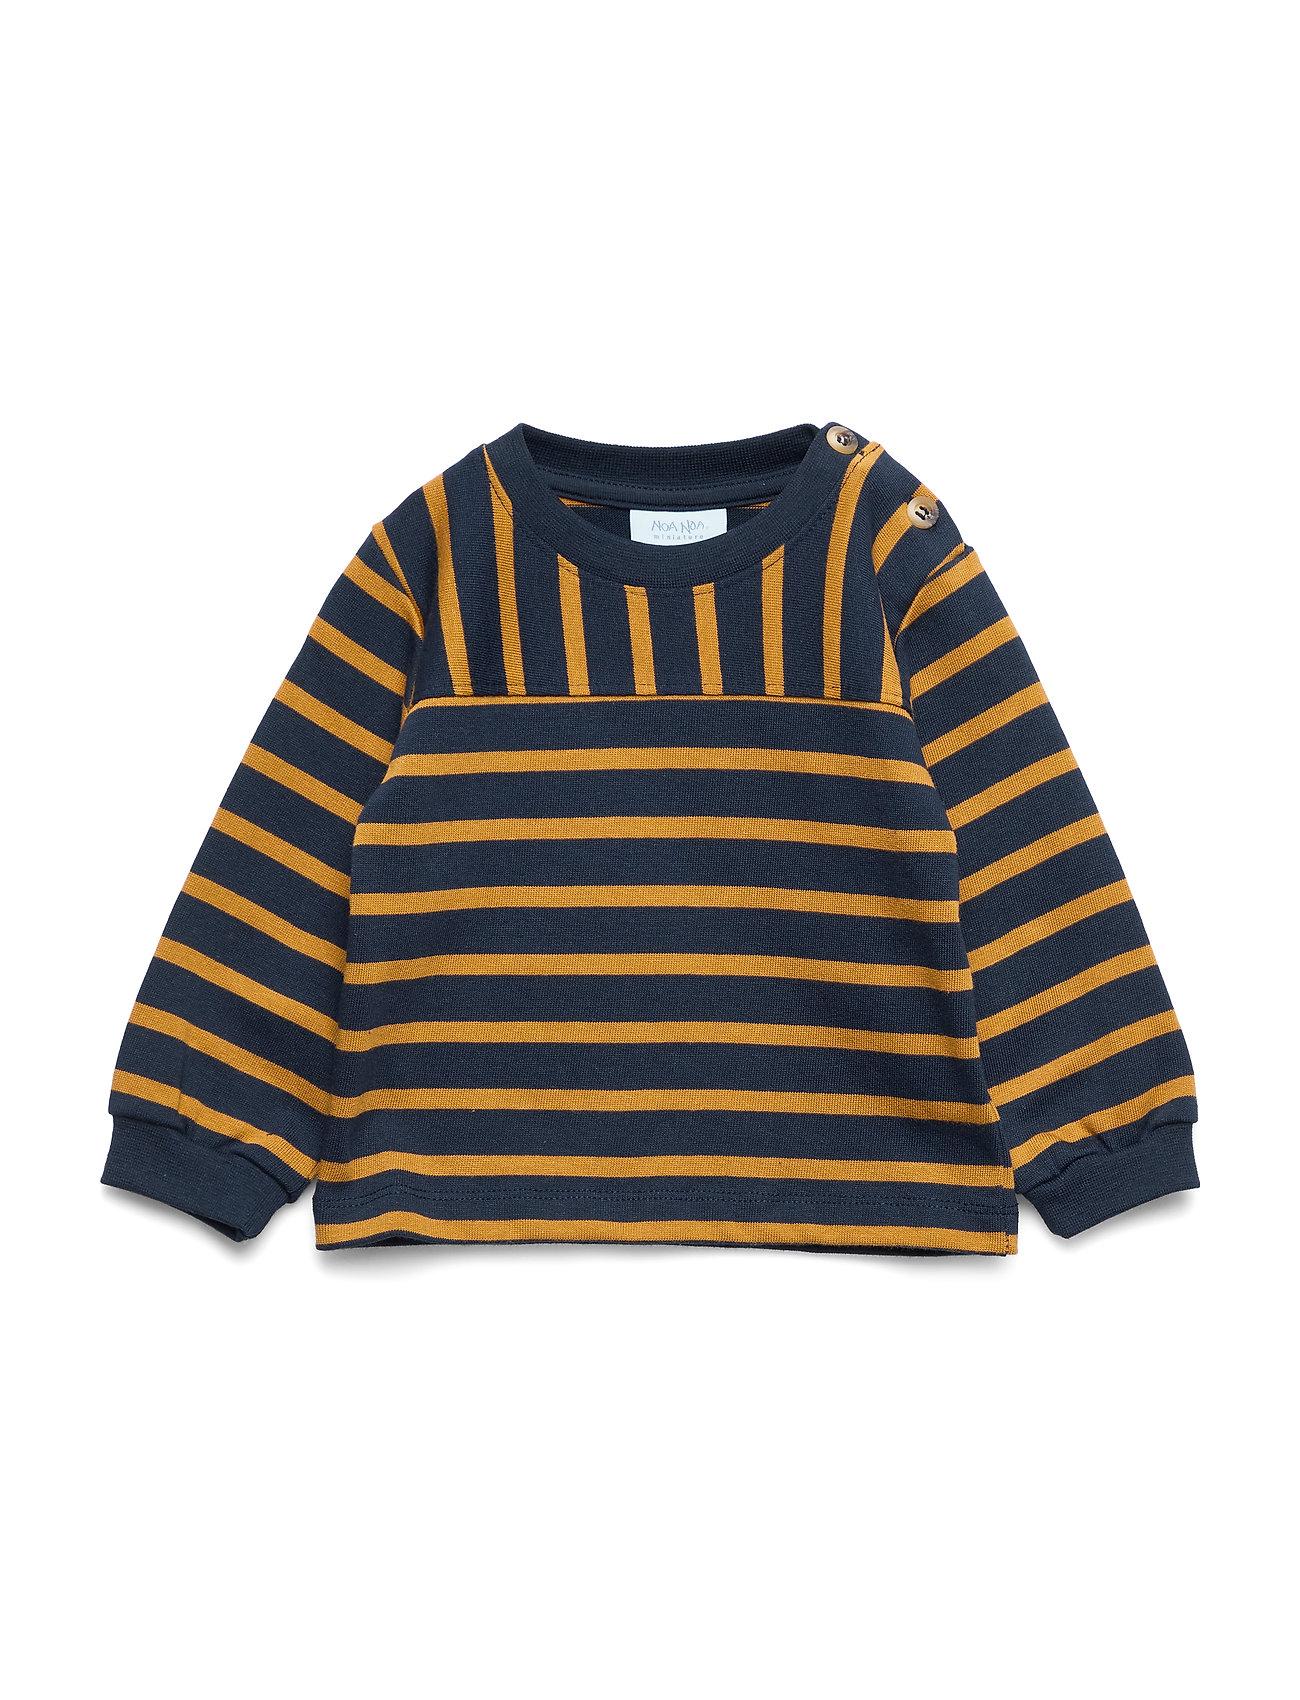 Noa Noa Miniature Pullover - NAVY BLAZER